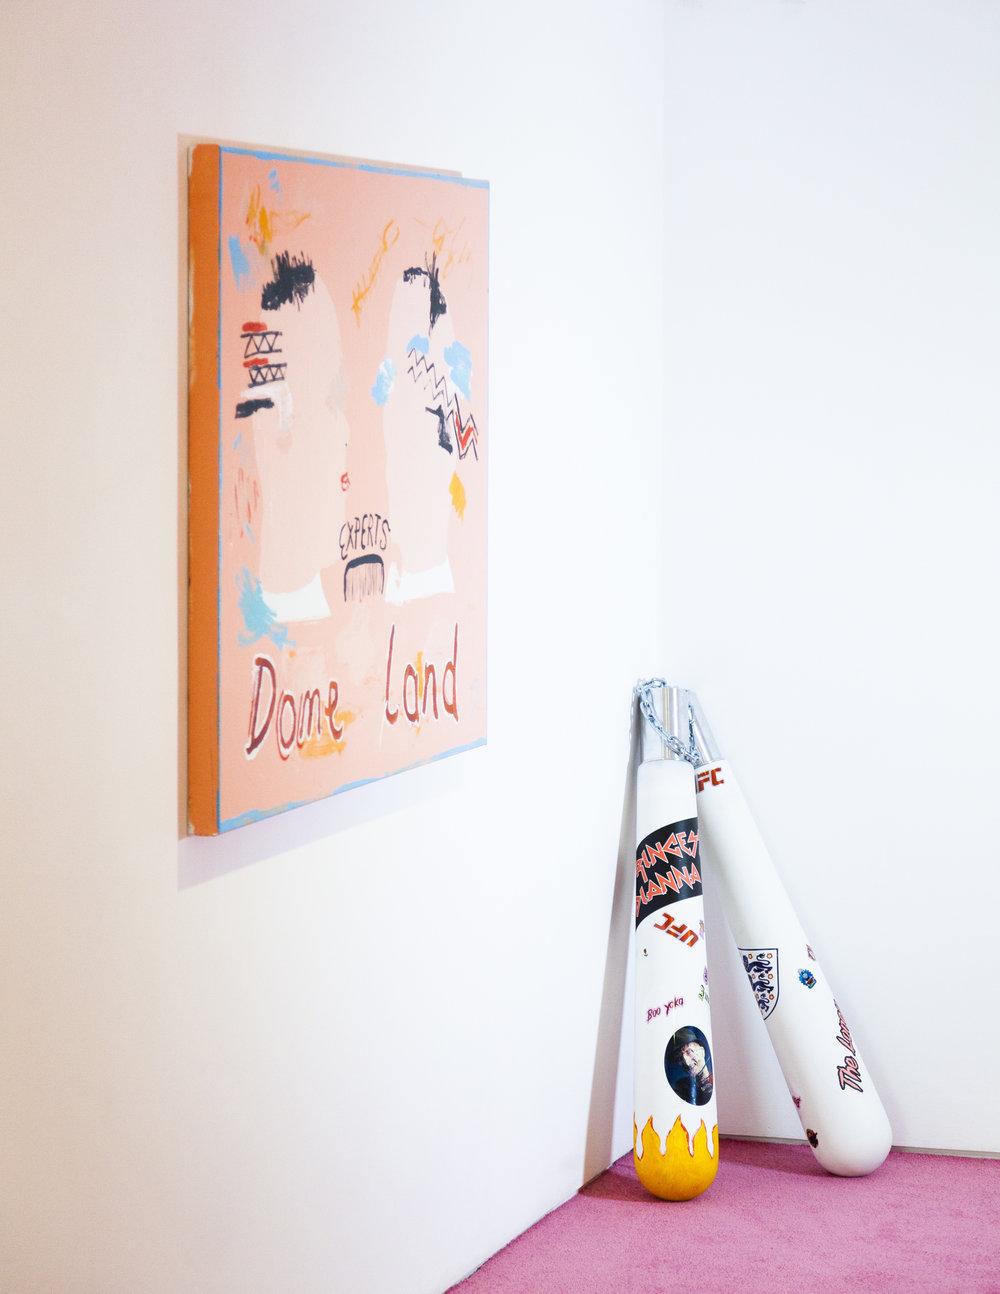 Mums princess Dianna Callander, acrylic on canvas, 2018, abstract art. Humber Street Gallery. Richie Culver.